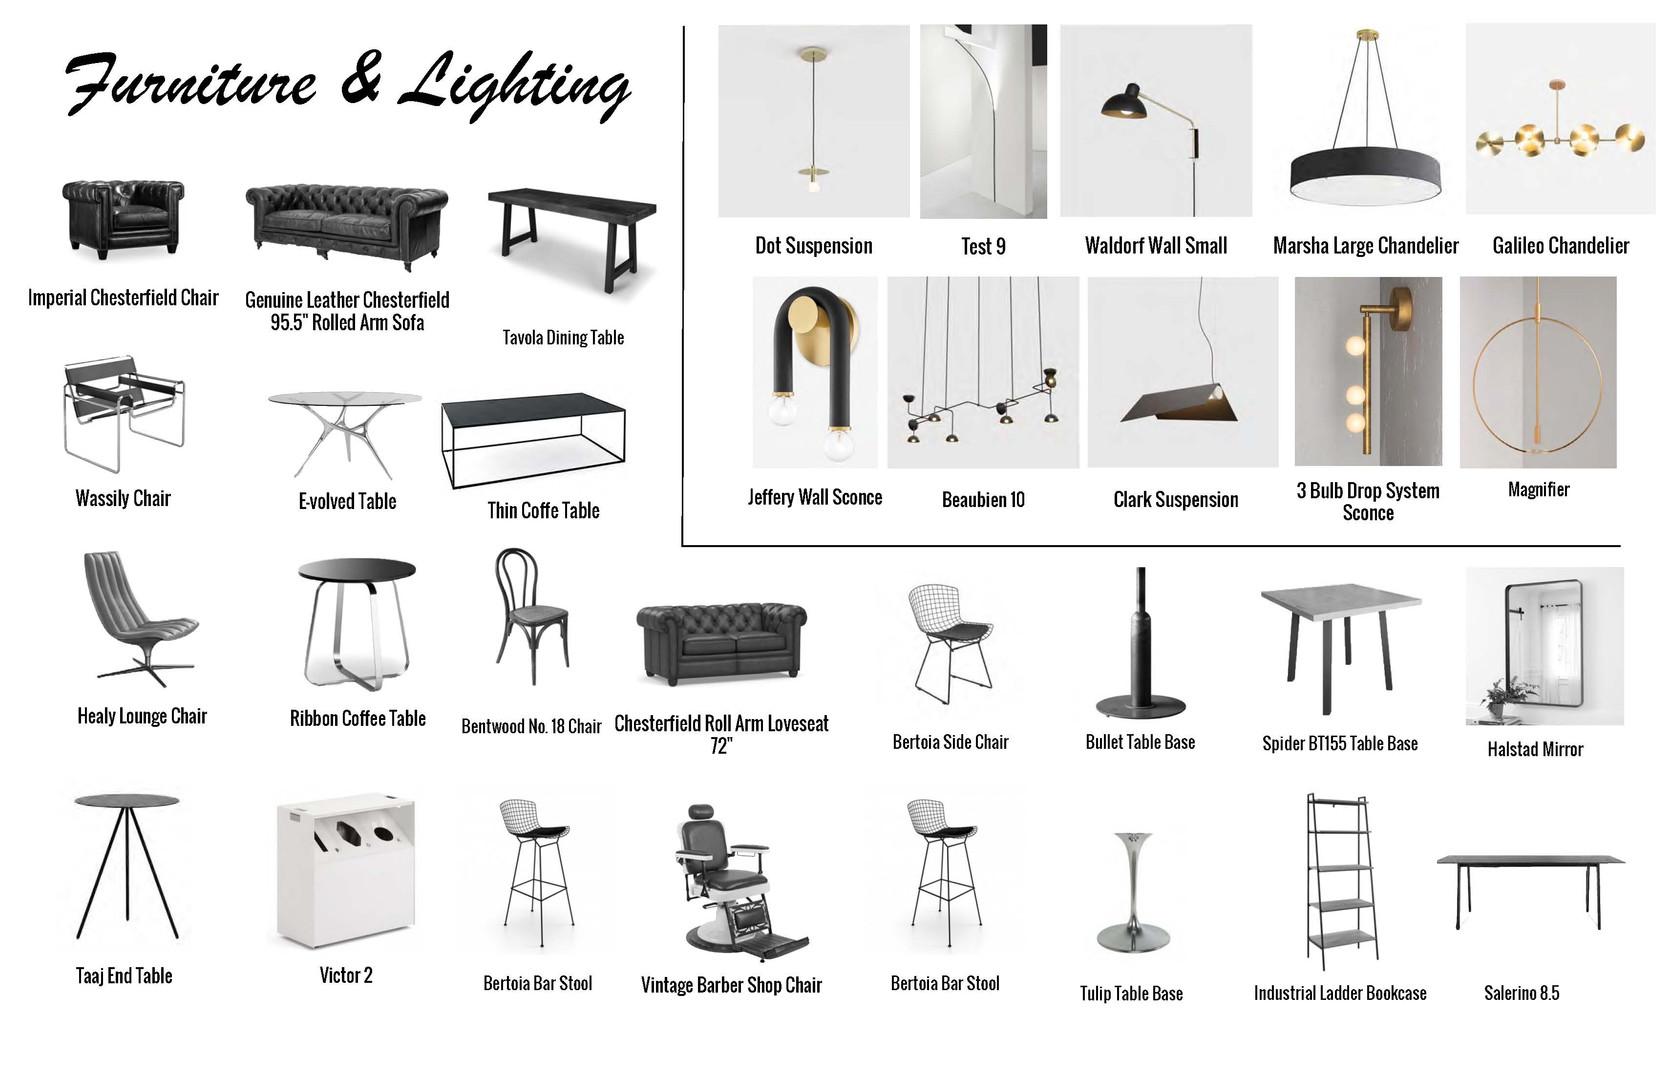 Furniture and Lighting.jpg